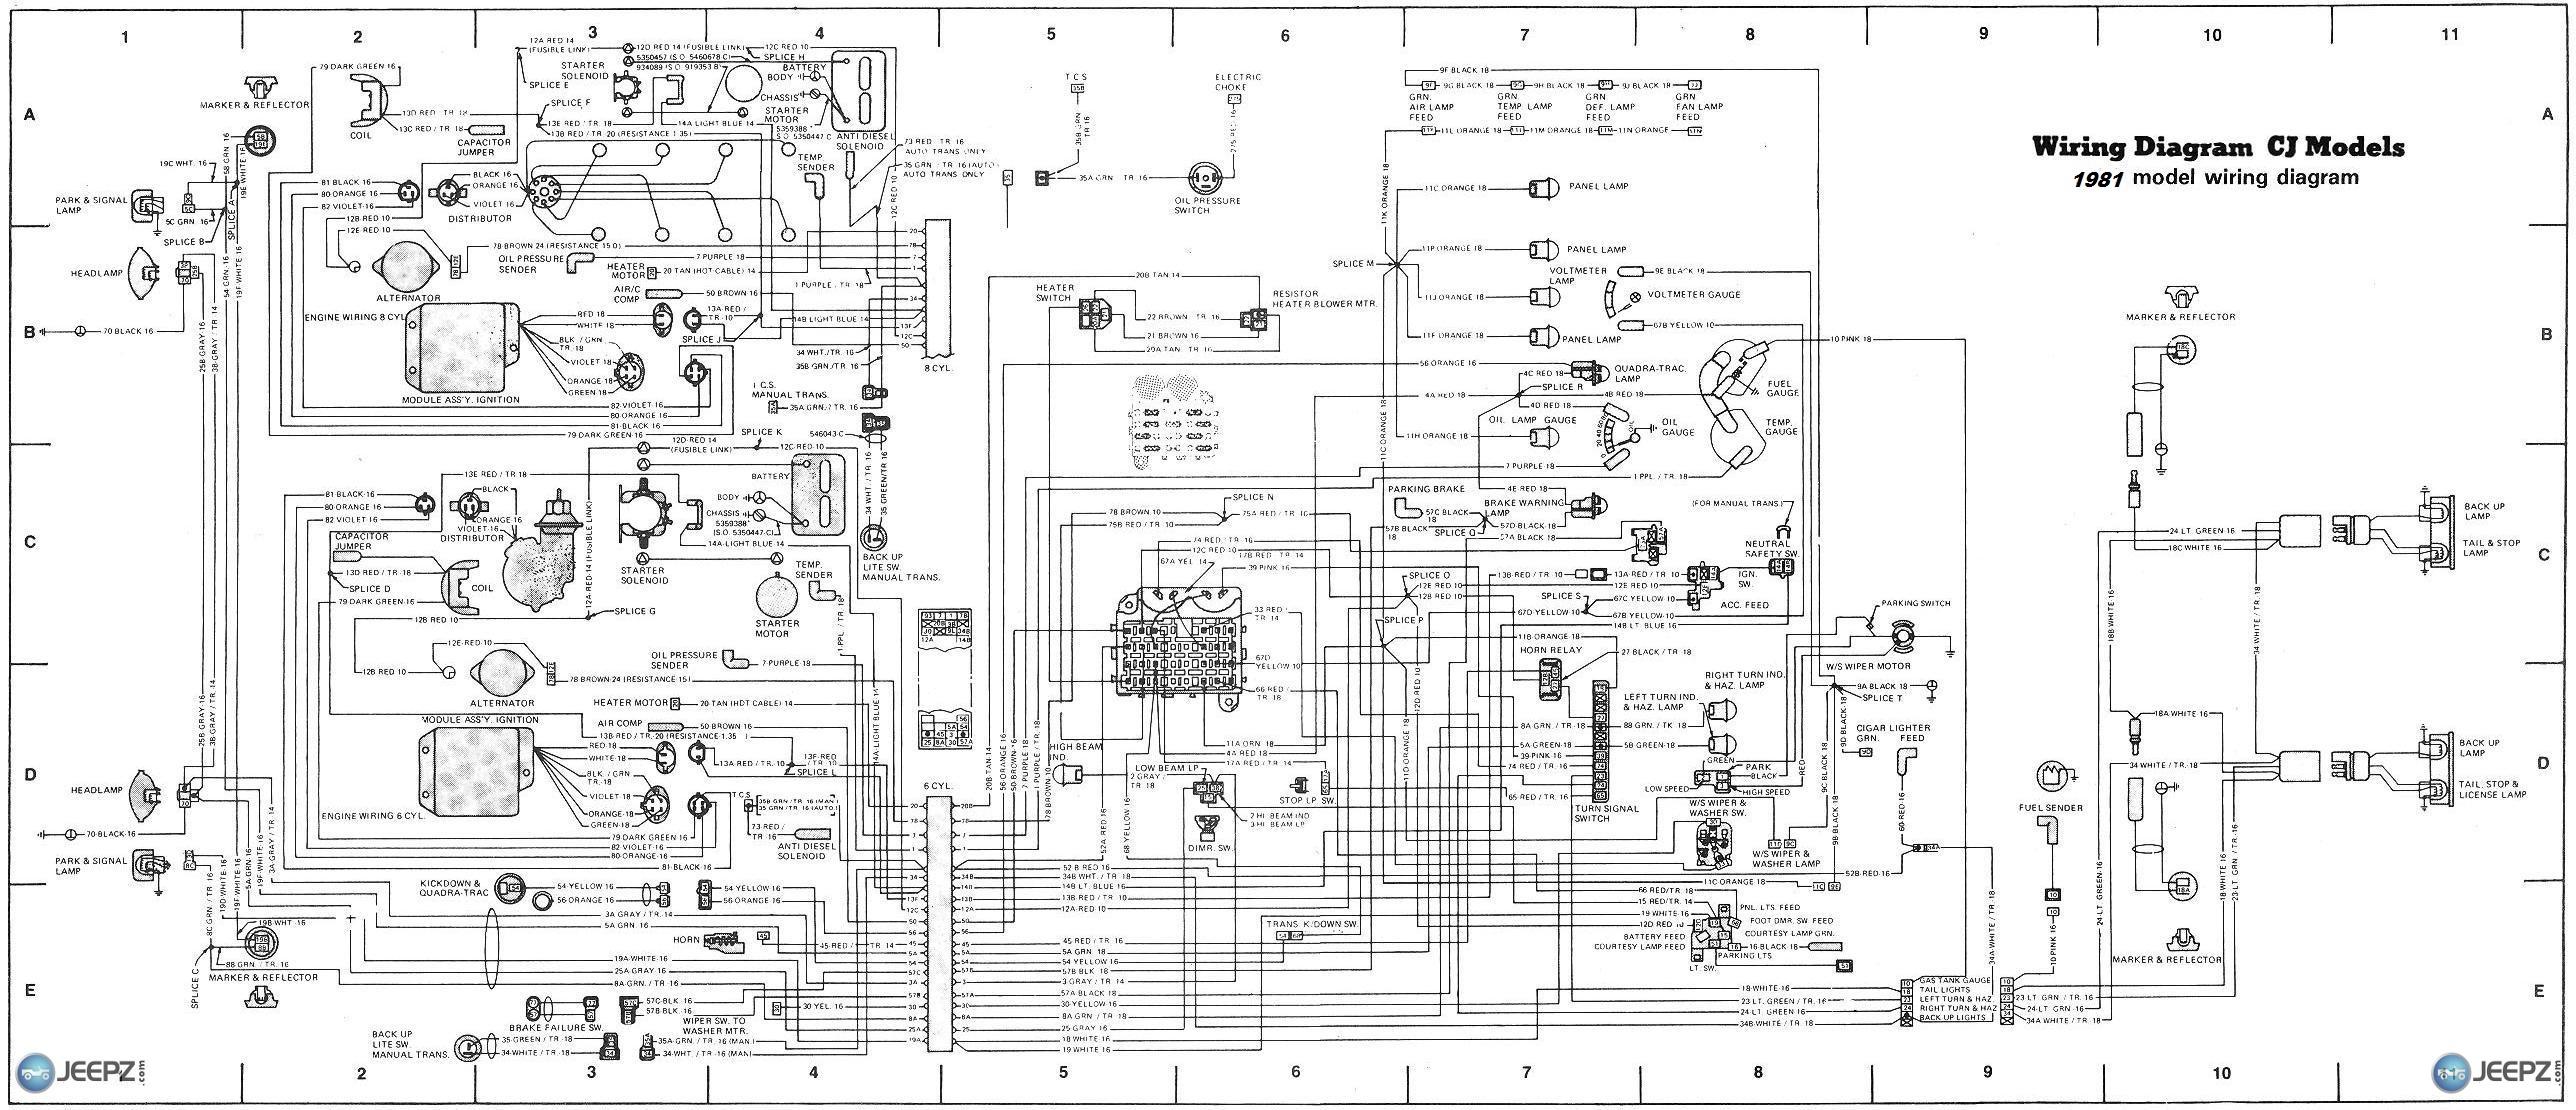 Miraculous Wrg 1299 Jeep Cj5 Ignition Wiring Wiring Cloud Grayisramohammedshrineorg